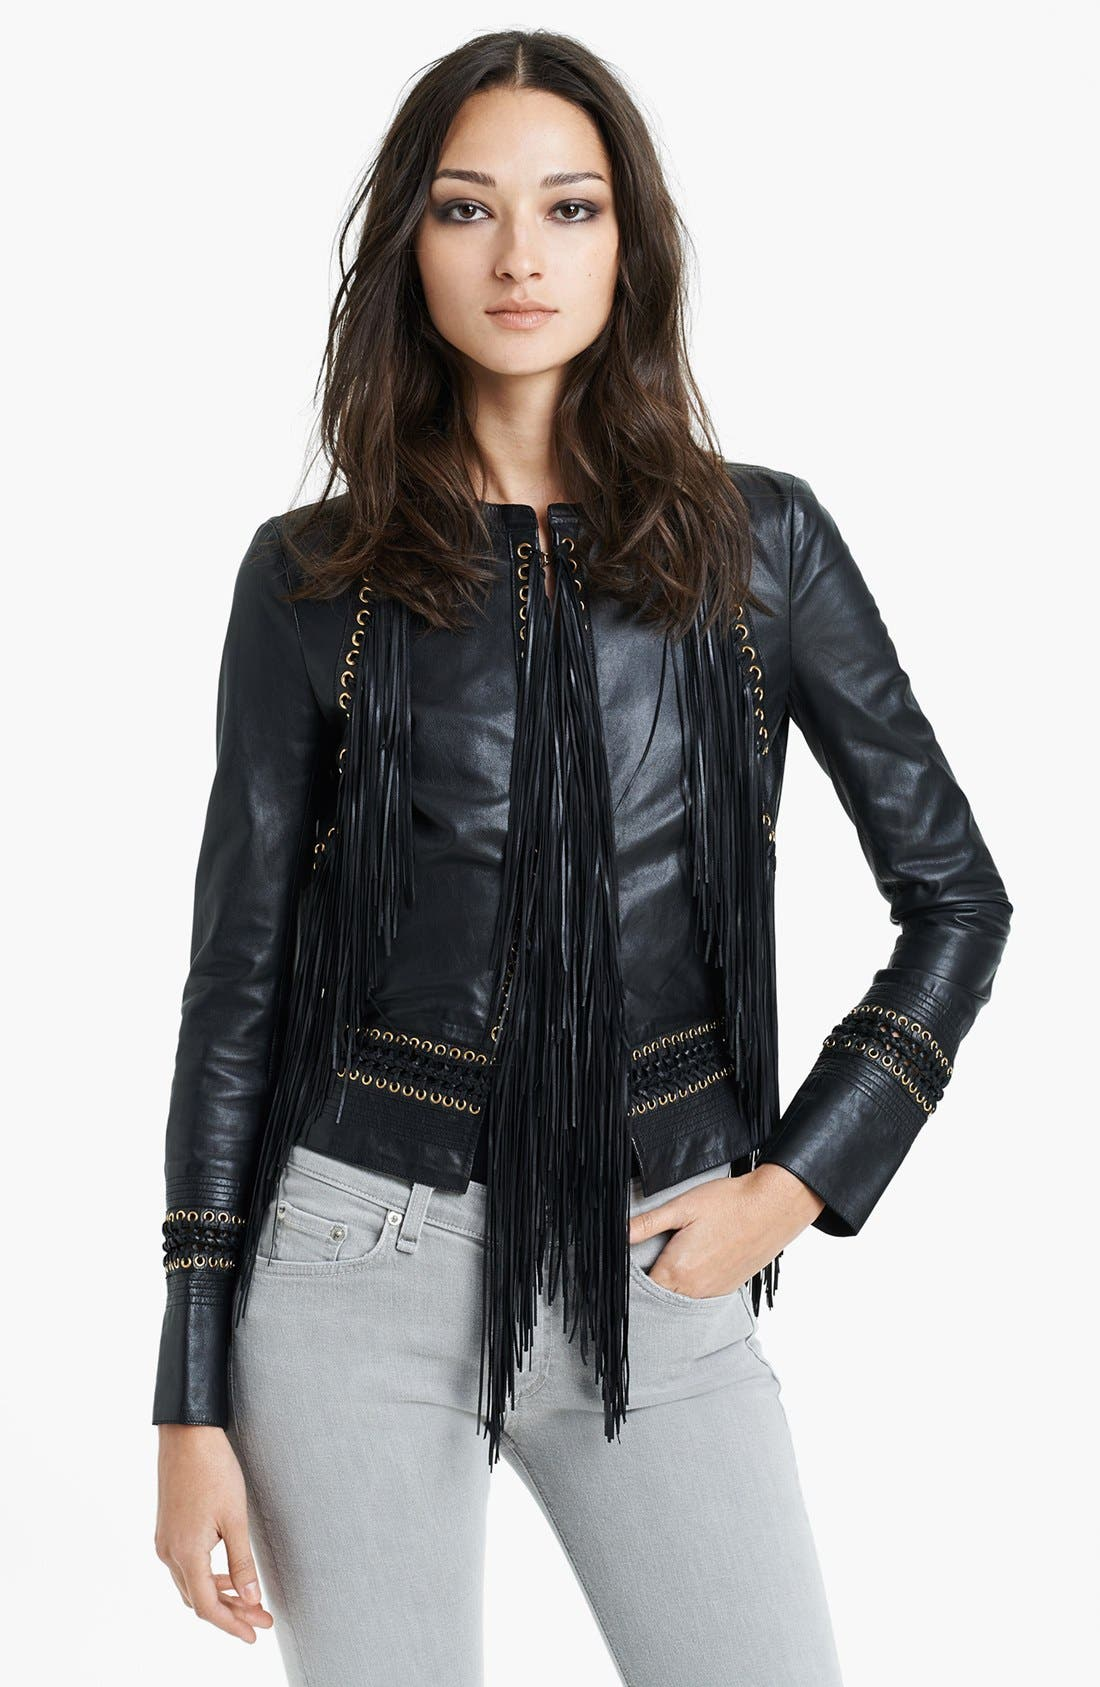 Alternate Image 1 Selected - Roberto Cavalli Fringe Detail Leather Jacket